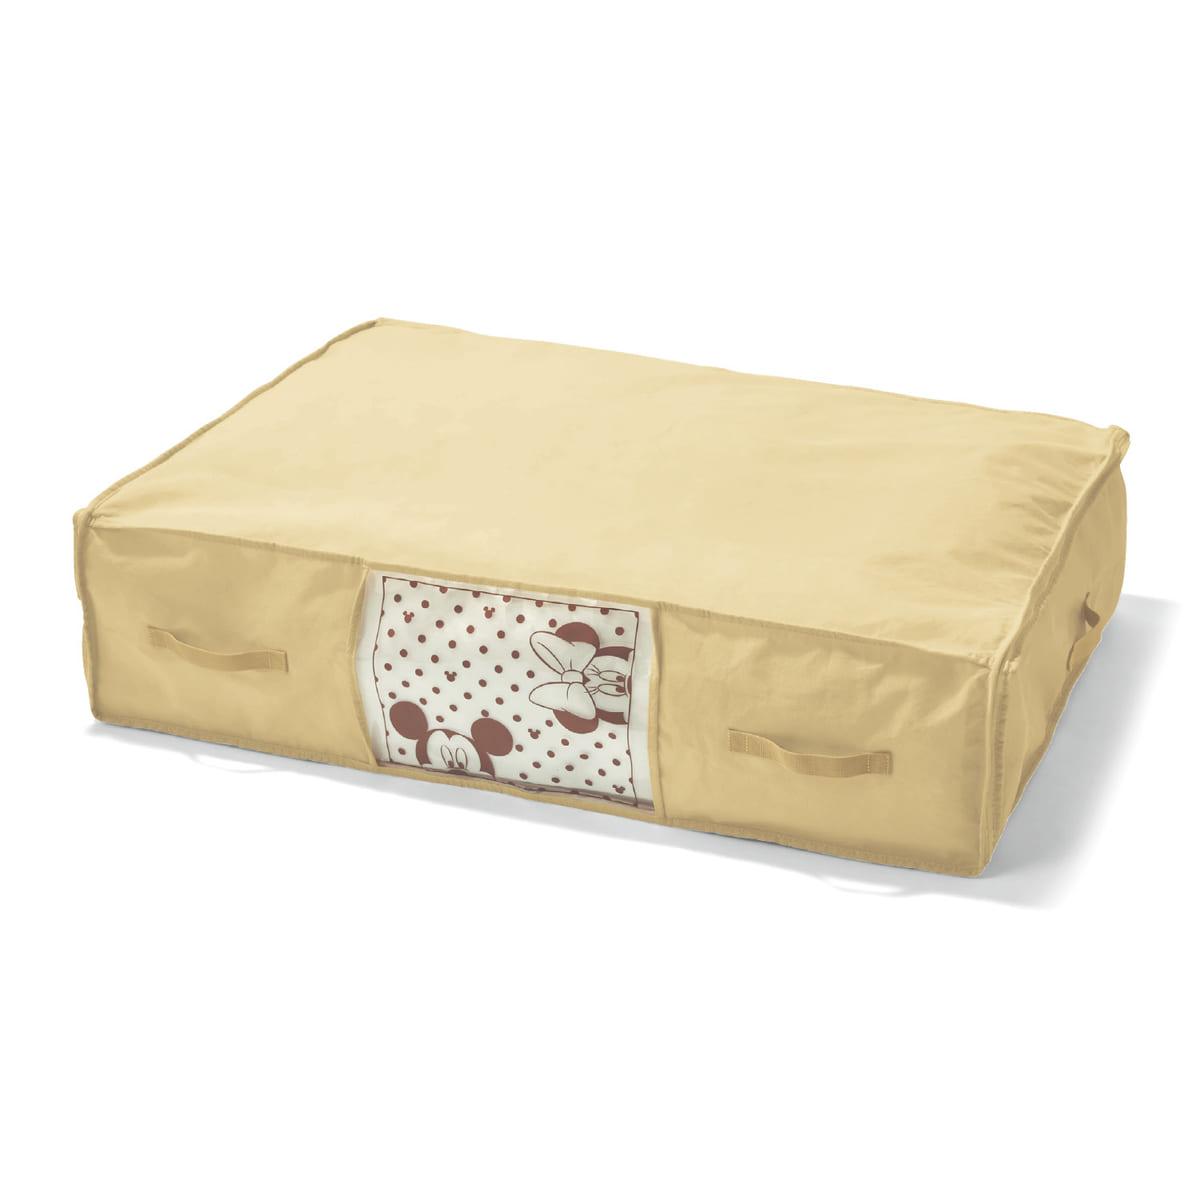 防ダニ・抗菌防臭の押し入れ用布団収納袋 掛布団・敷布団・毛布用